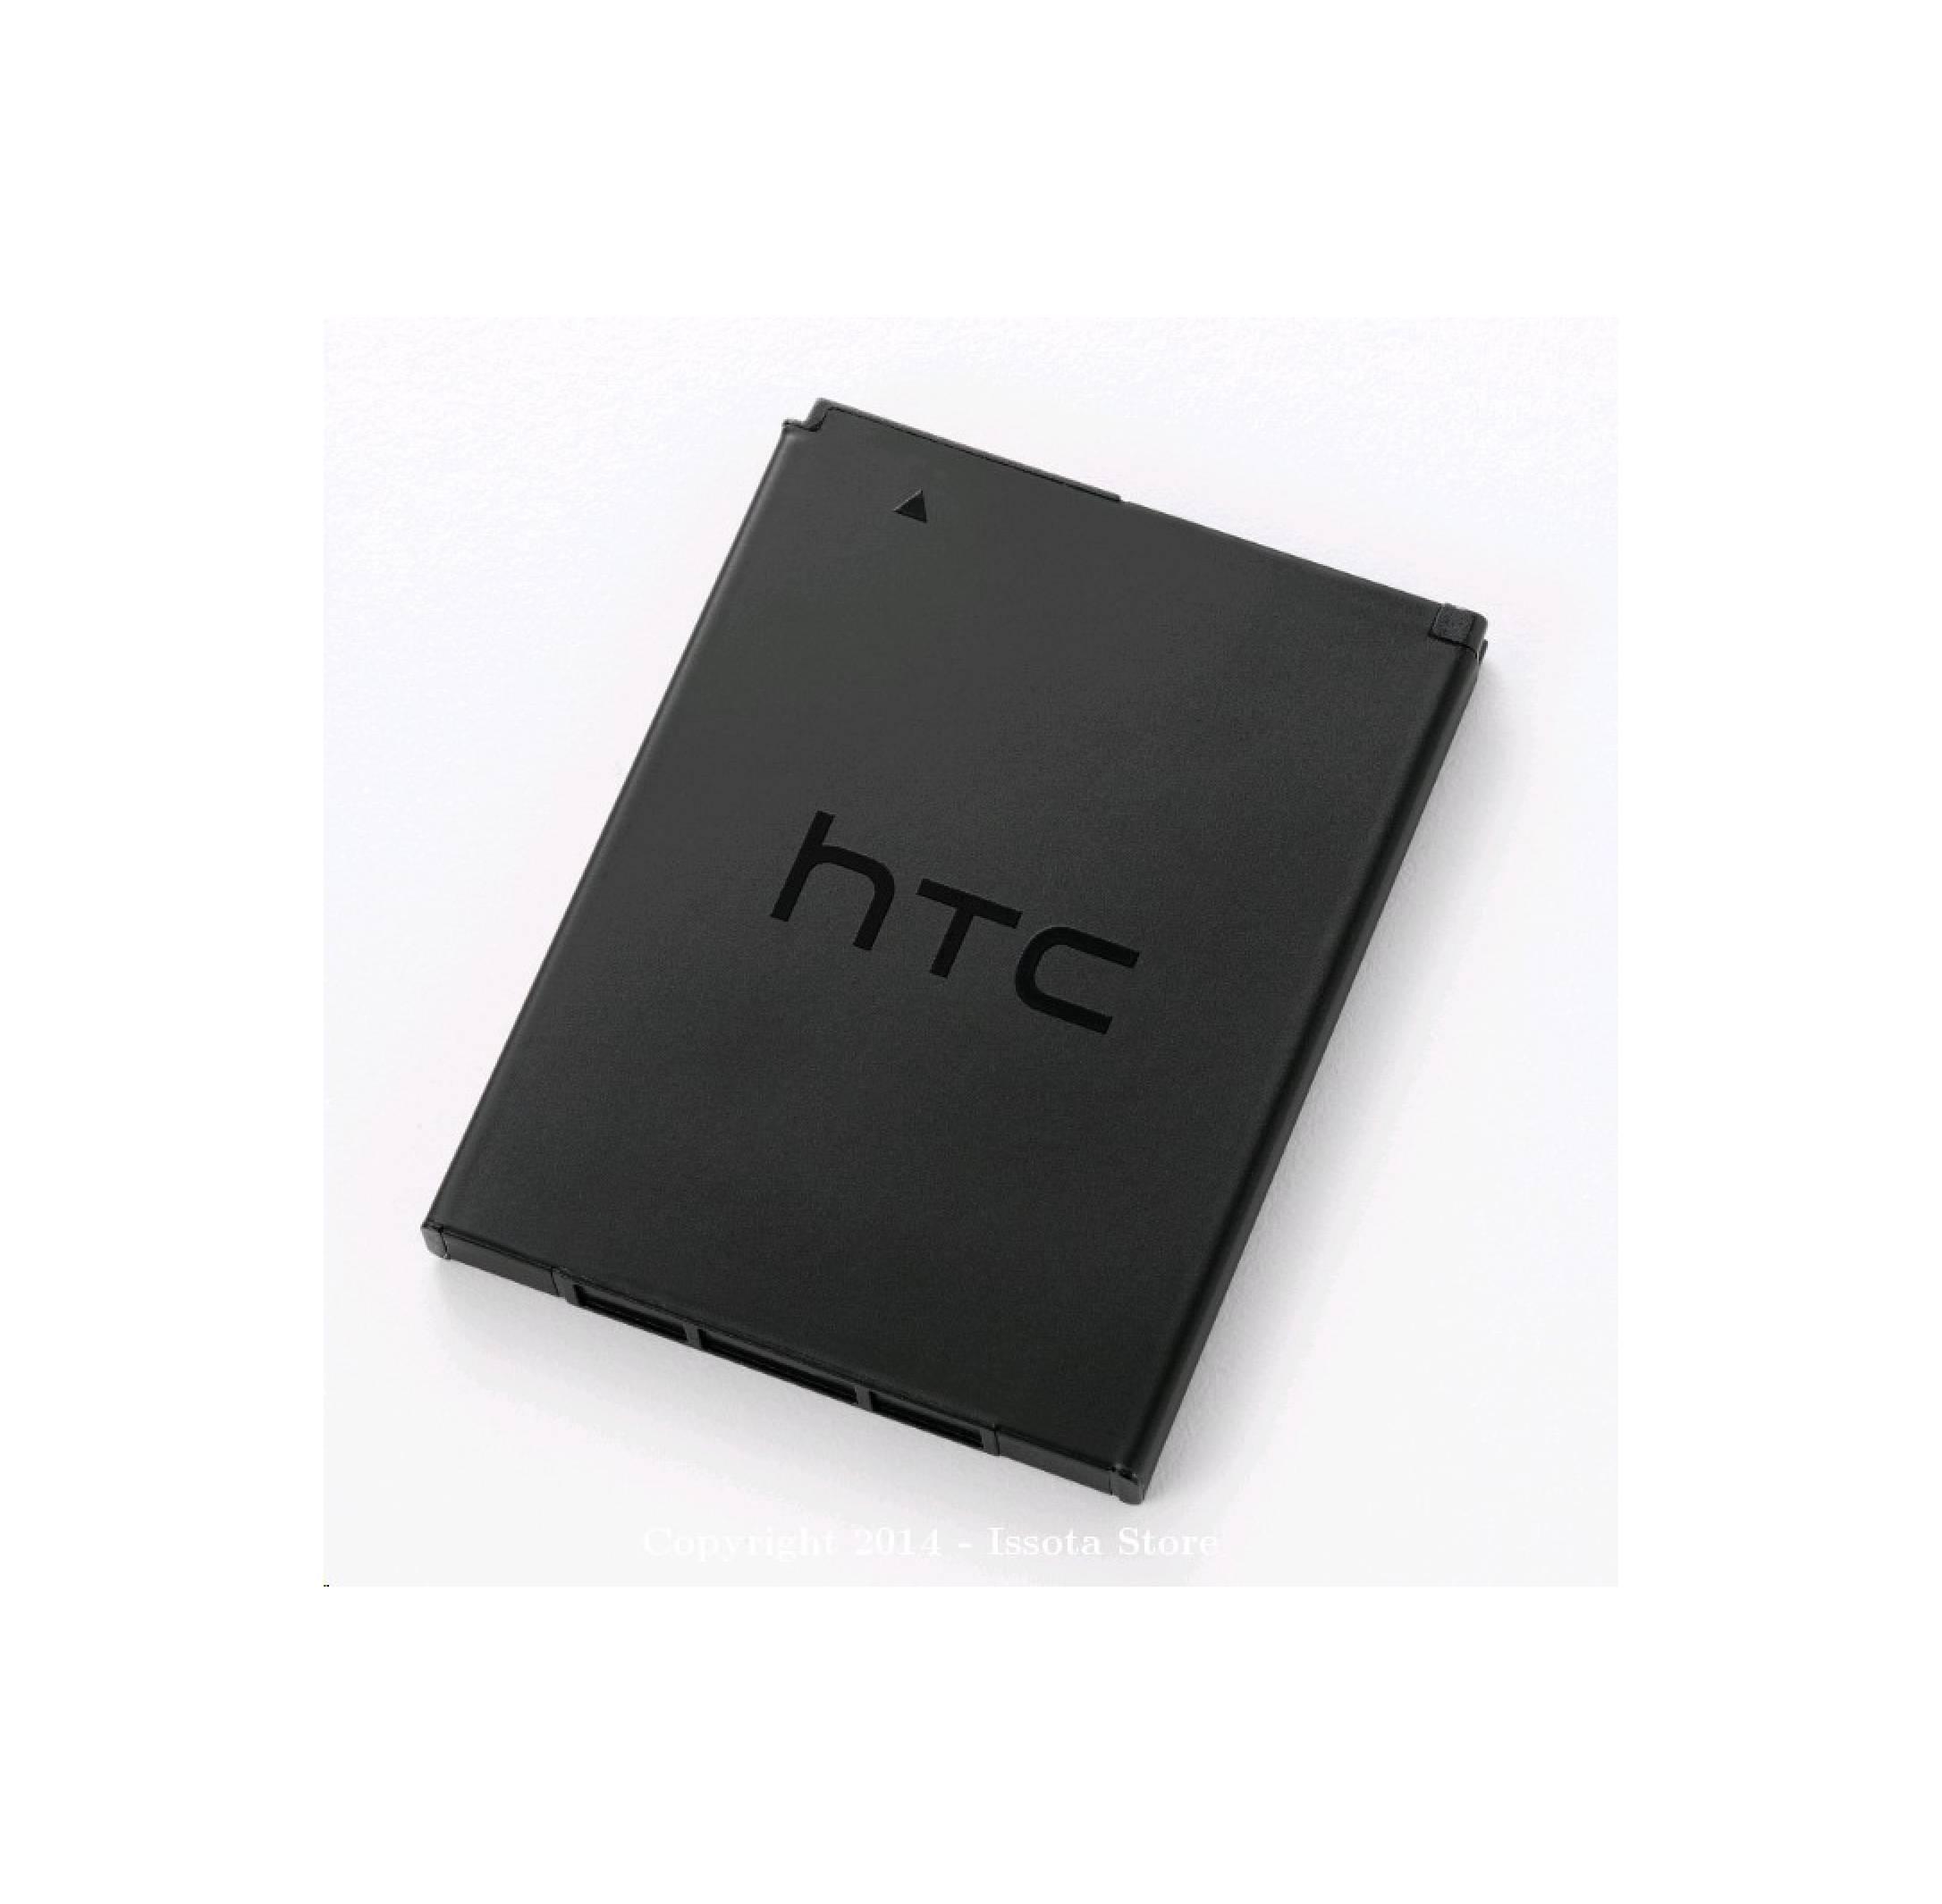 HTC T528 / One SV / SU / SC / ONE ST Seri BM60100 Original 100%